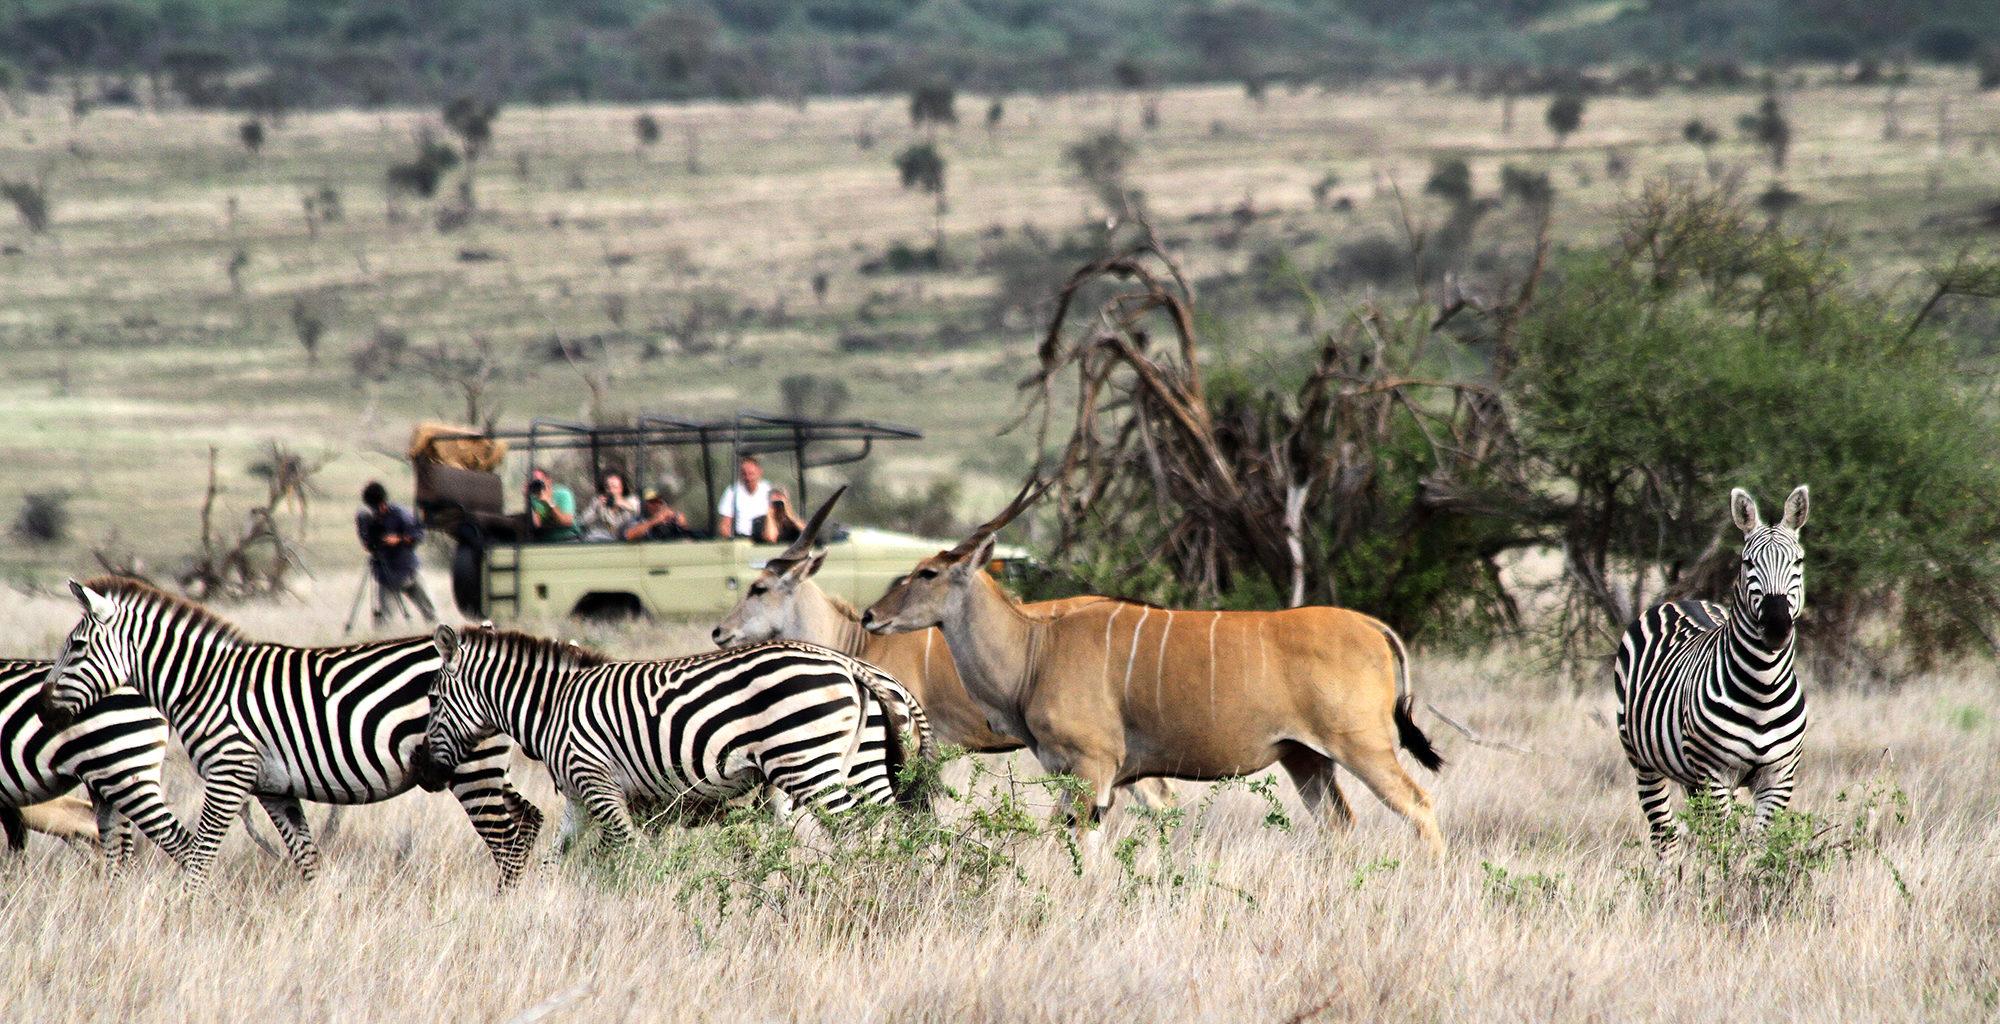 Tanzania-West-Kilimanjaro-Wildlife